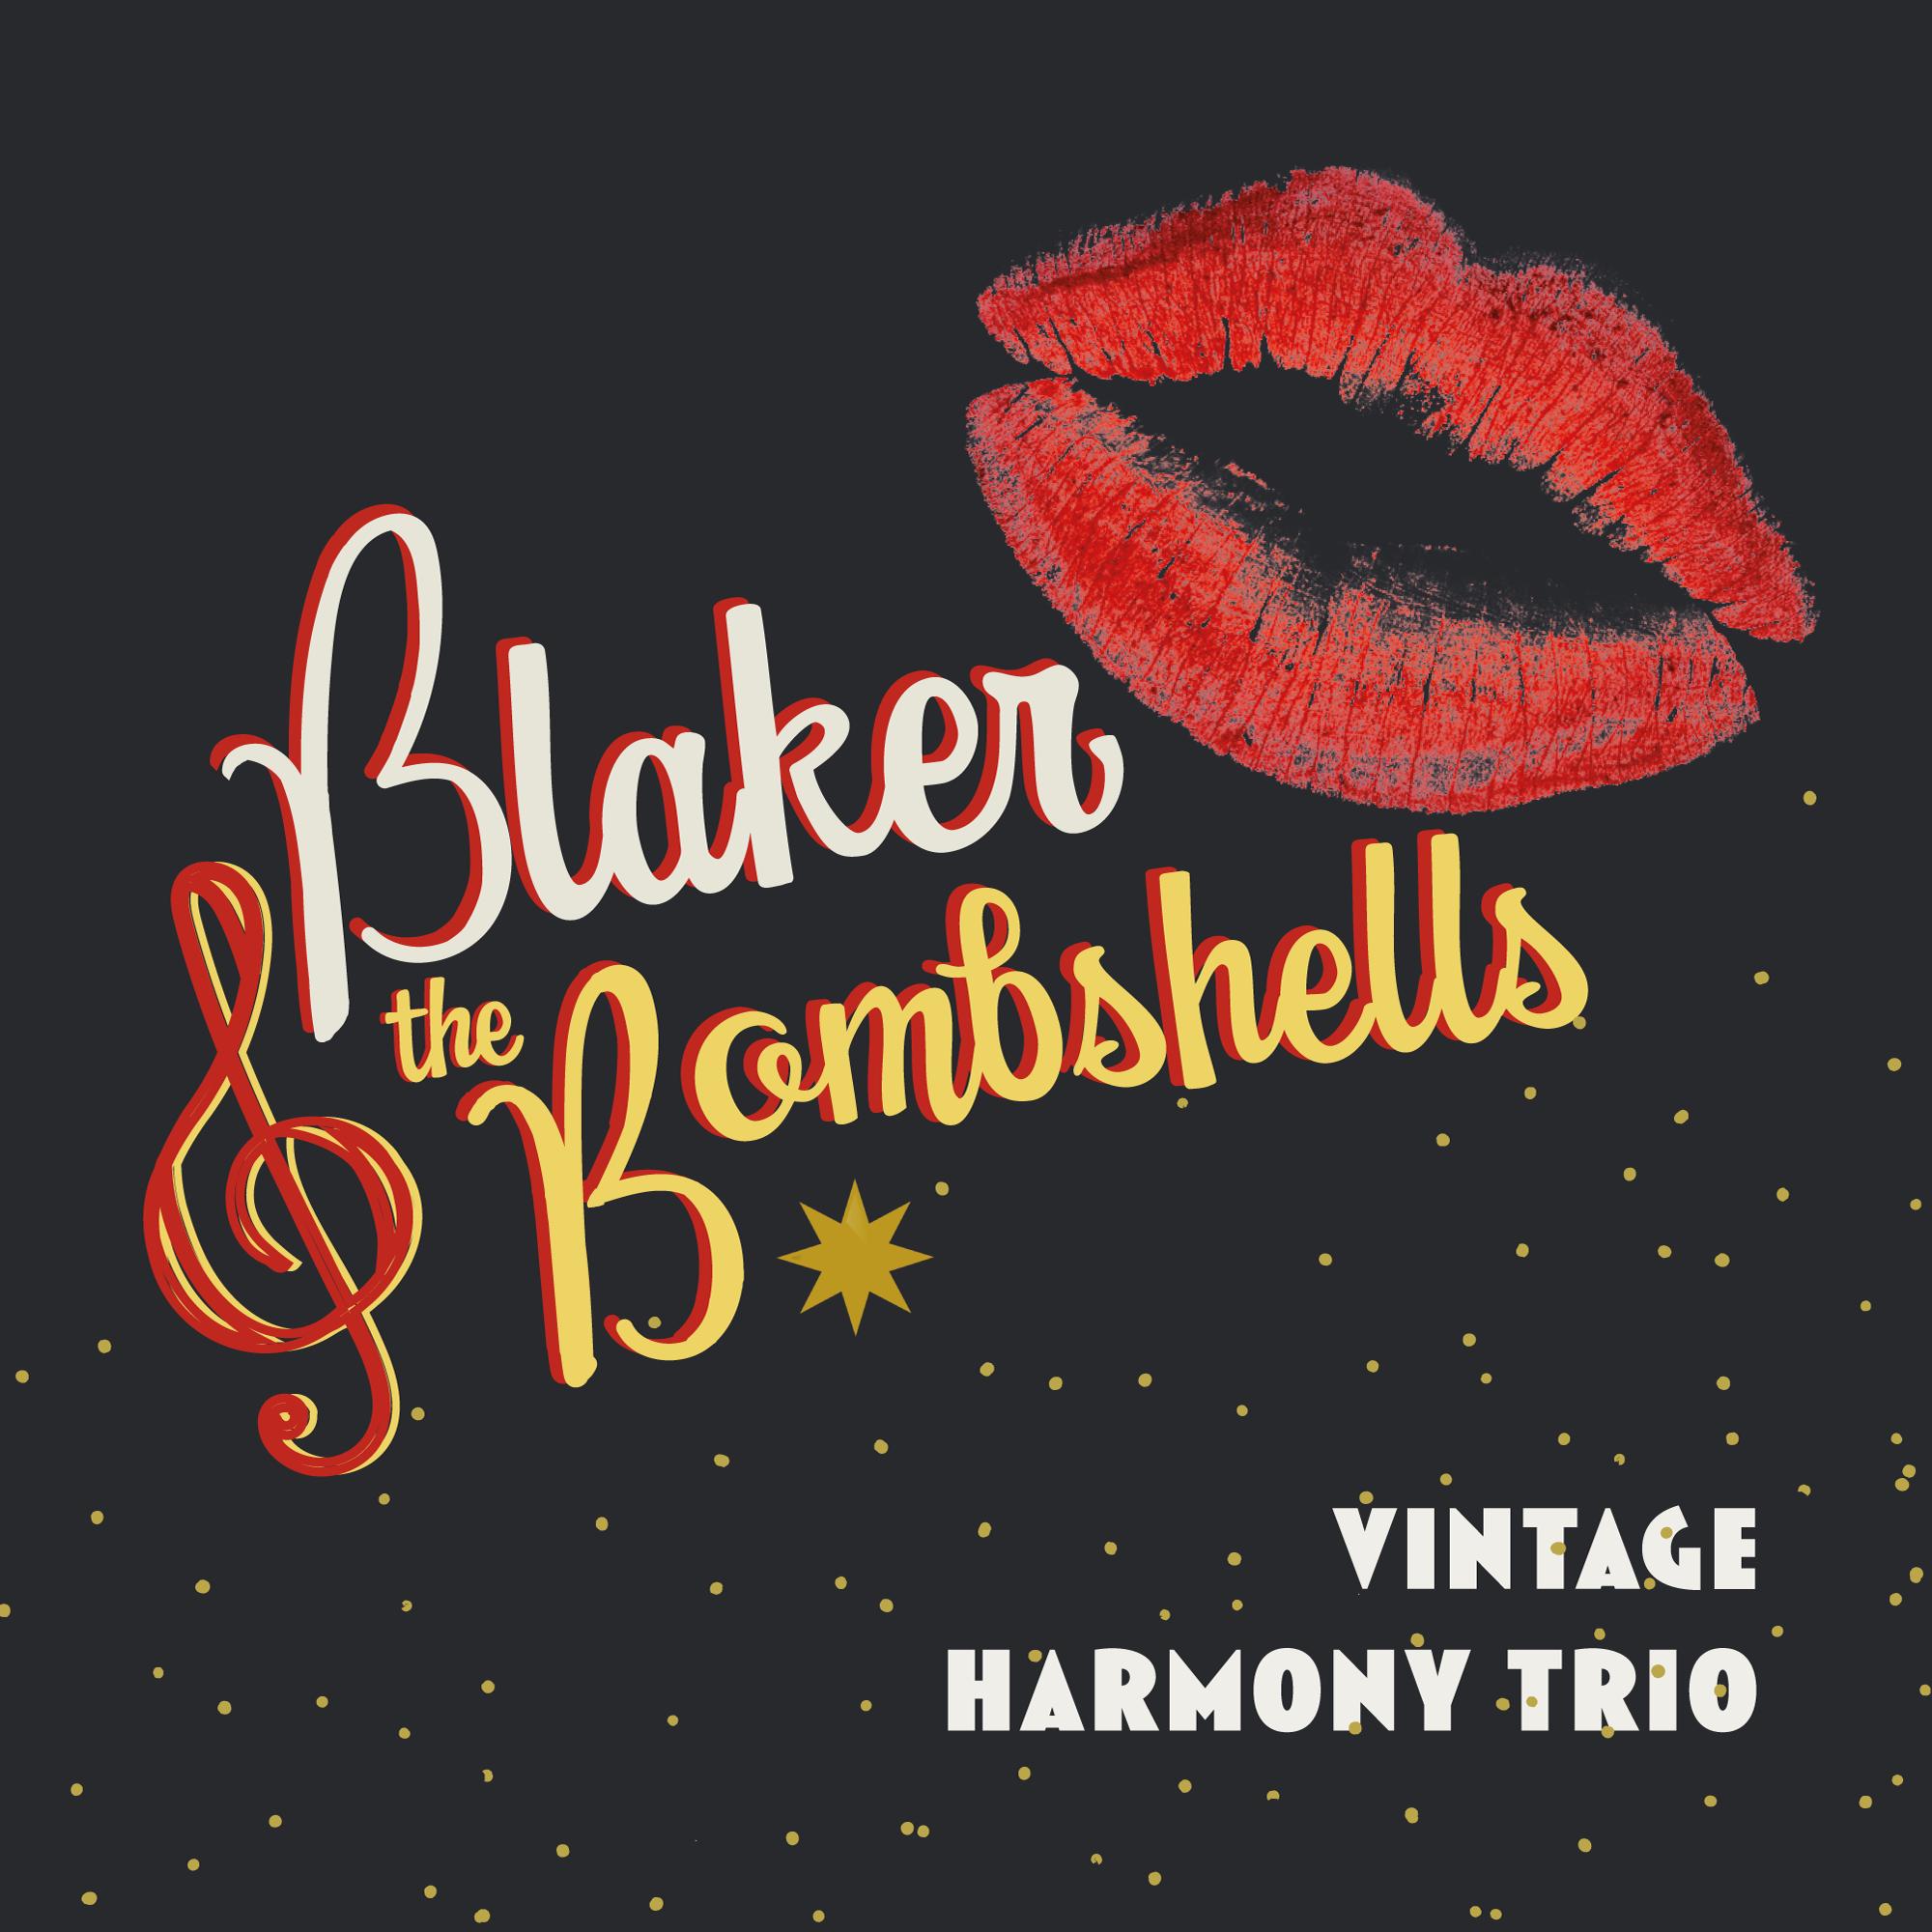 vintage harmony trio